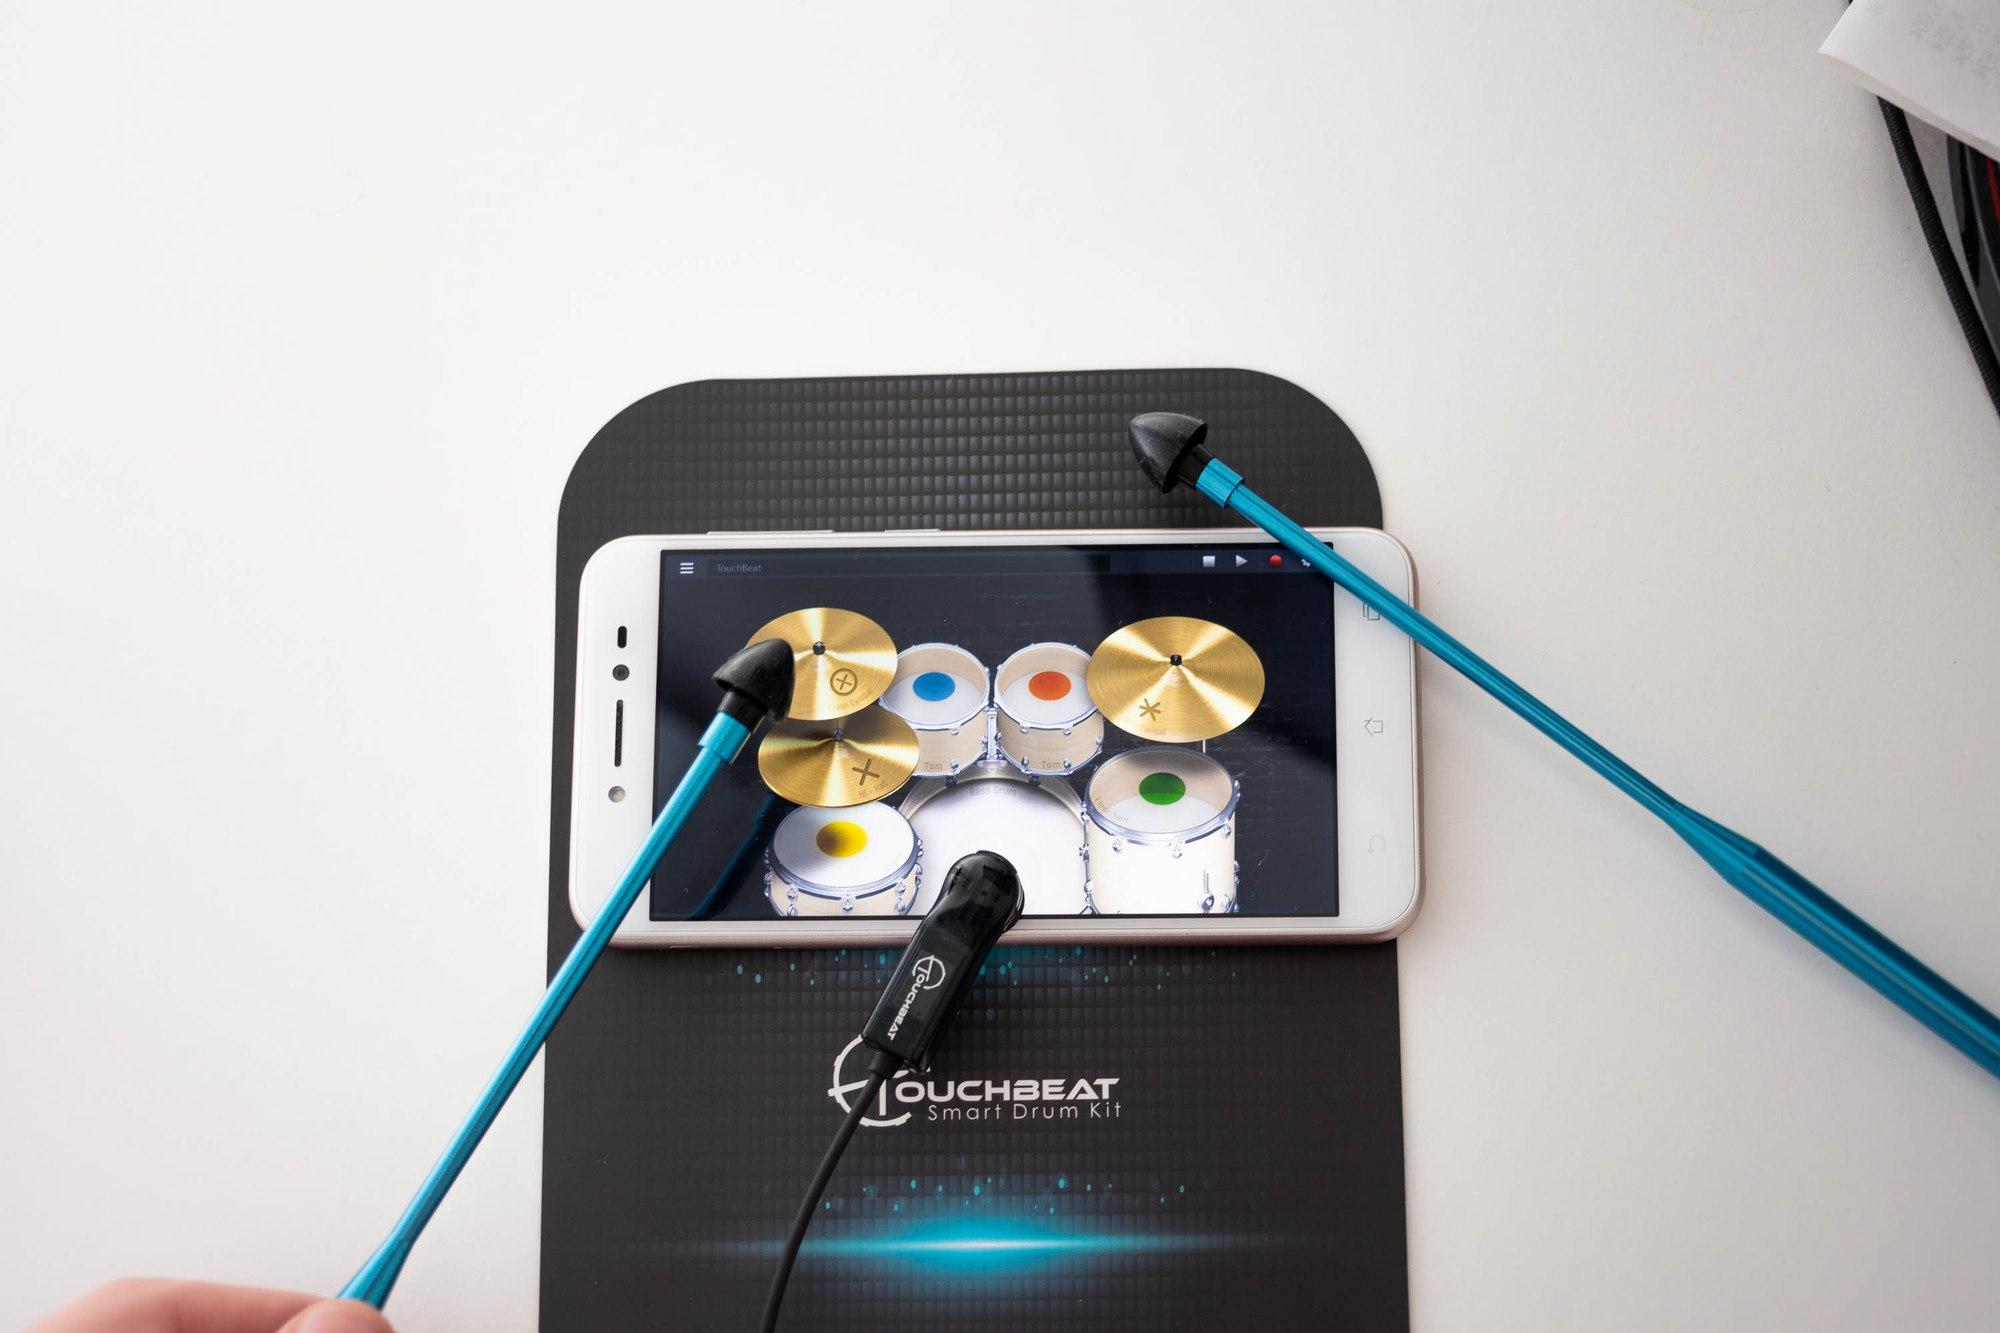 Touchbeat Smart Drum kit : dispositif